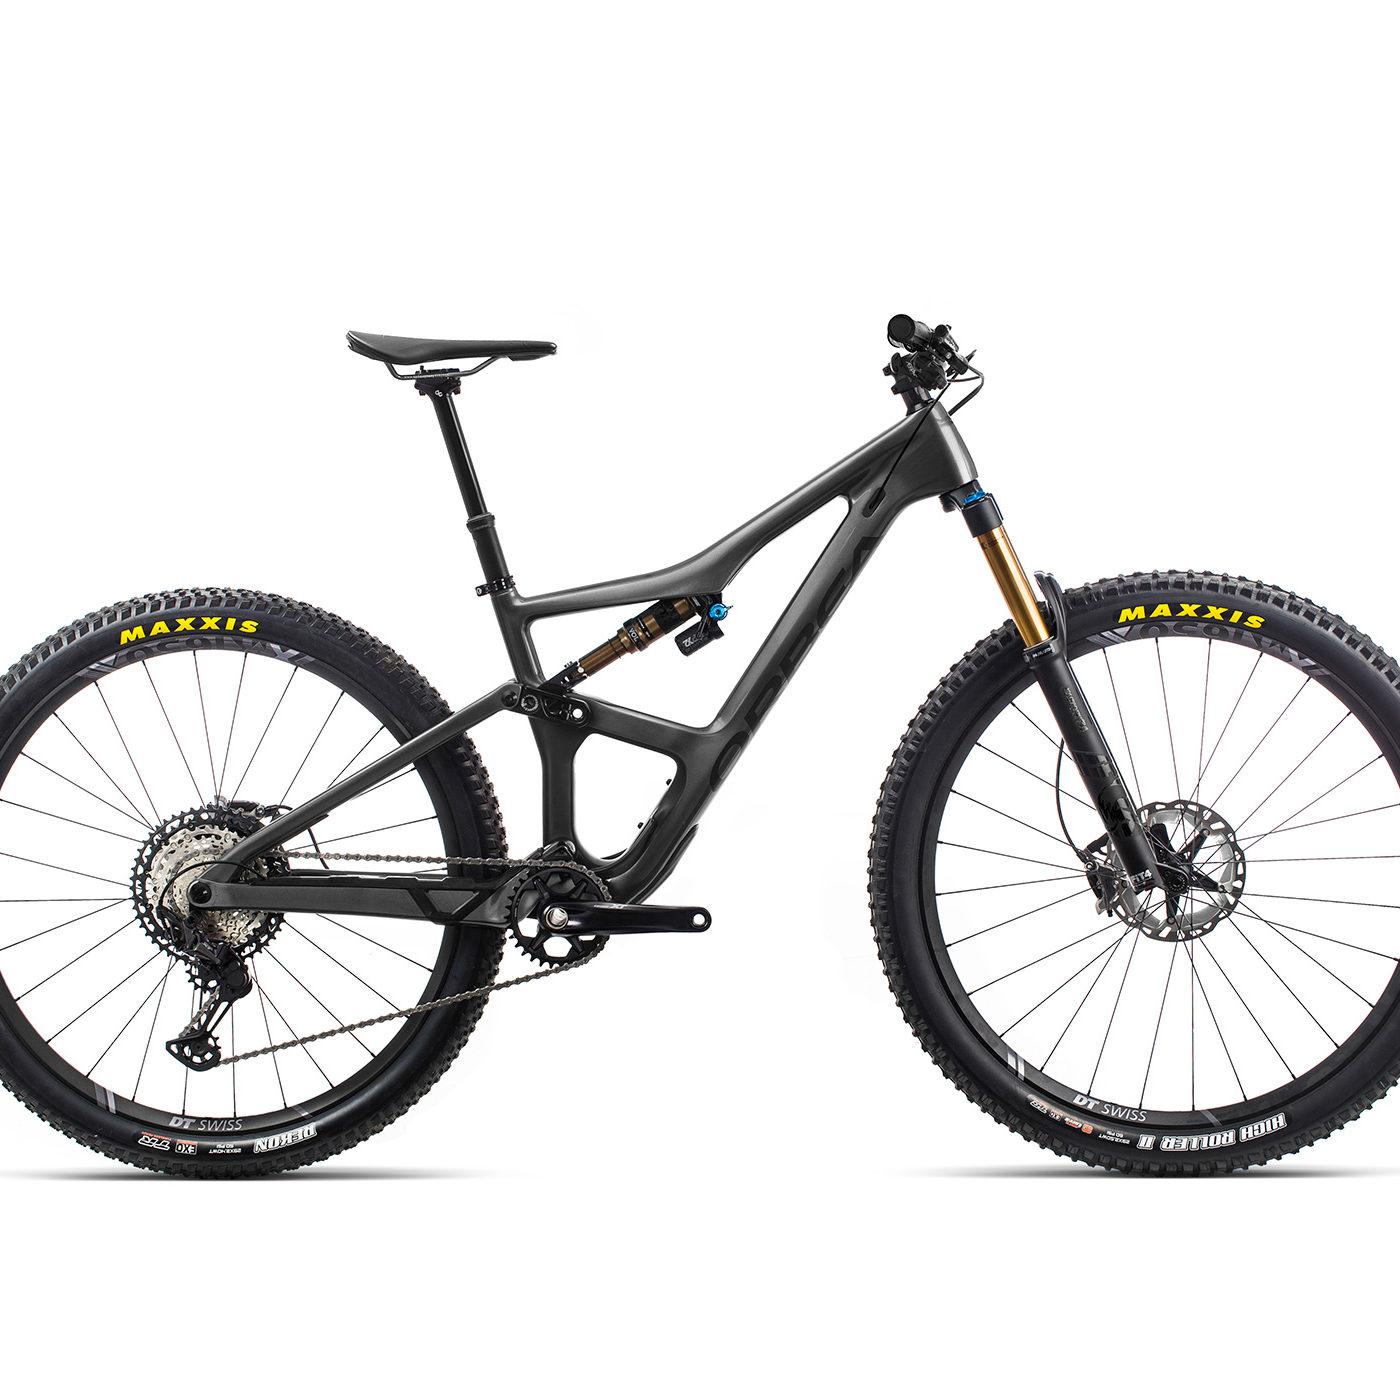 ORBEA Occam M10 - ANTRACIET GLITTER (GLOSS) / ZWART (DOF) @G-Bikes